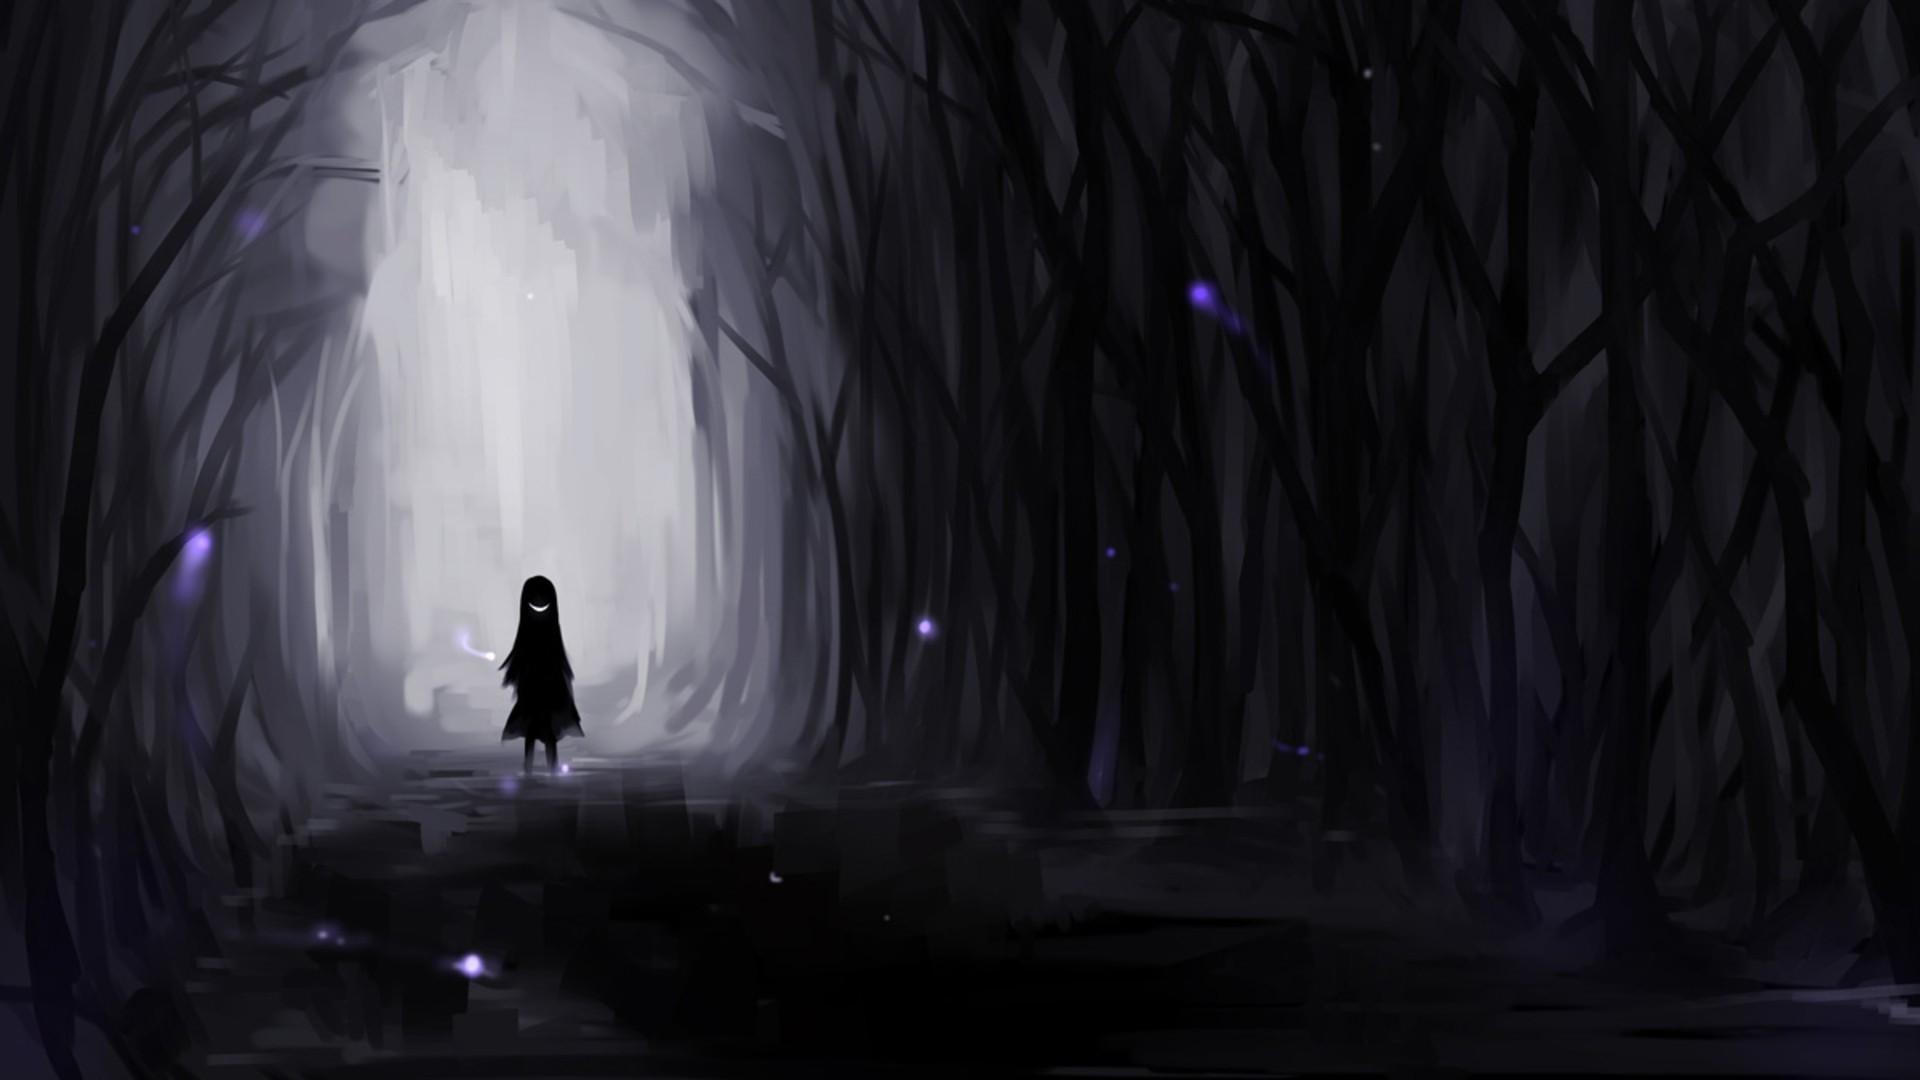 Res: 1920x1080, Creepy dark forest evil smiles anime drawn  wallpaper